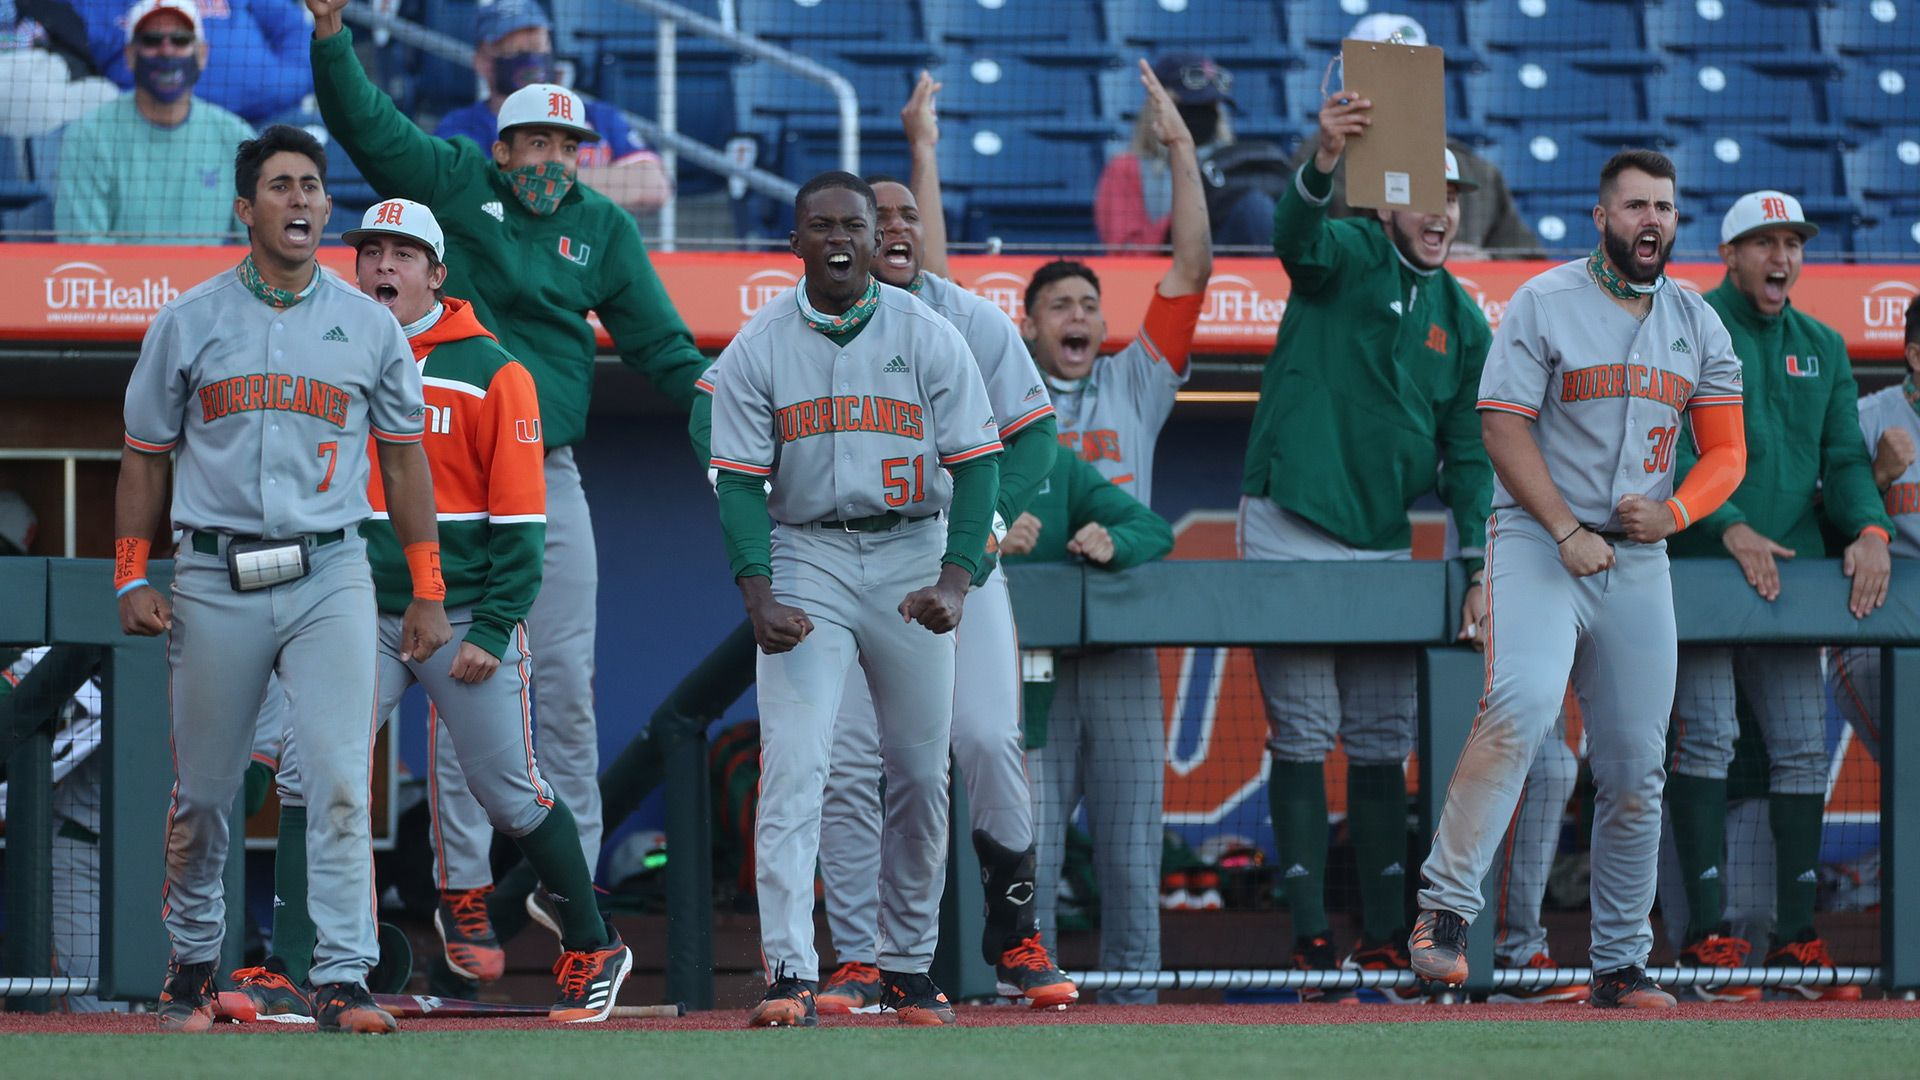 Gators Chomped: Miami Takes Series at No. 1 Florida